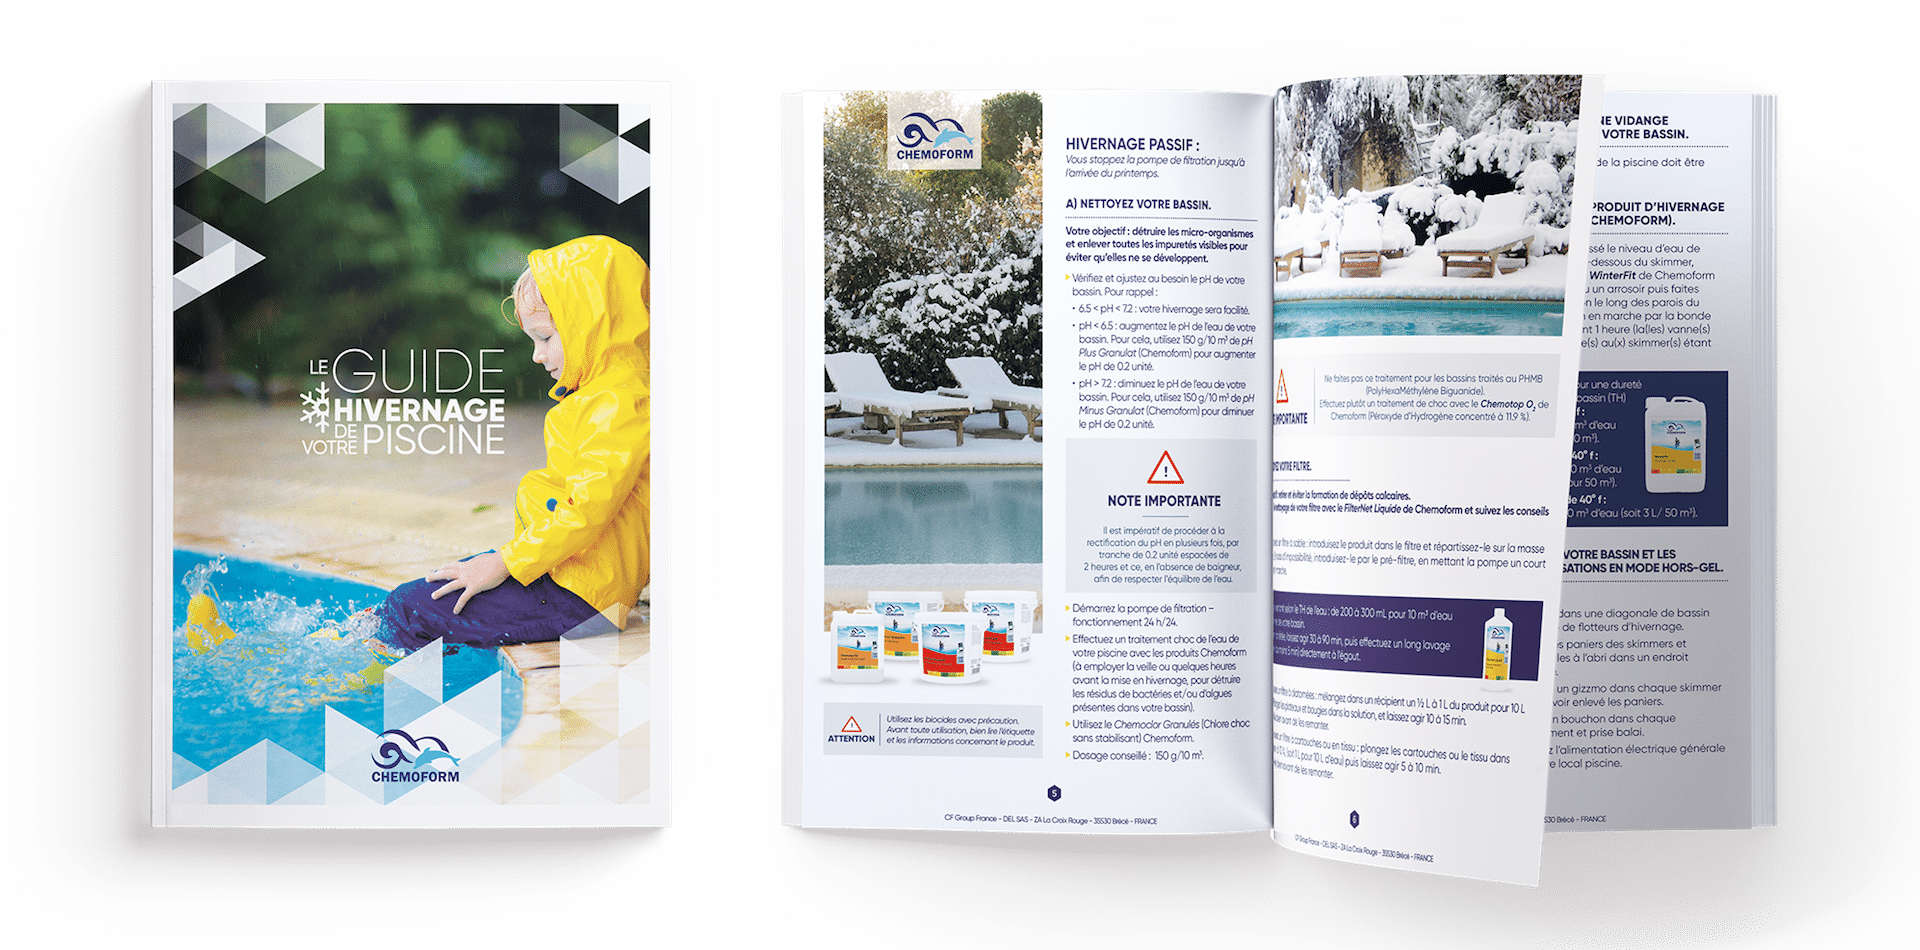 Guide hivernage Chemoform